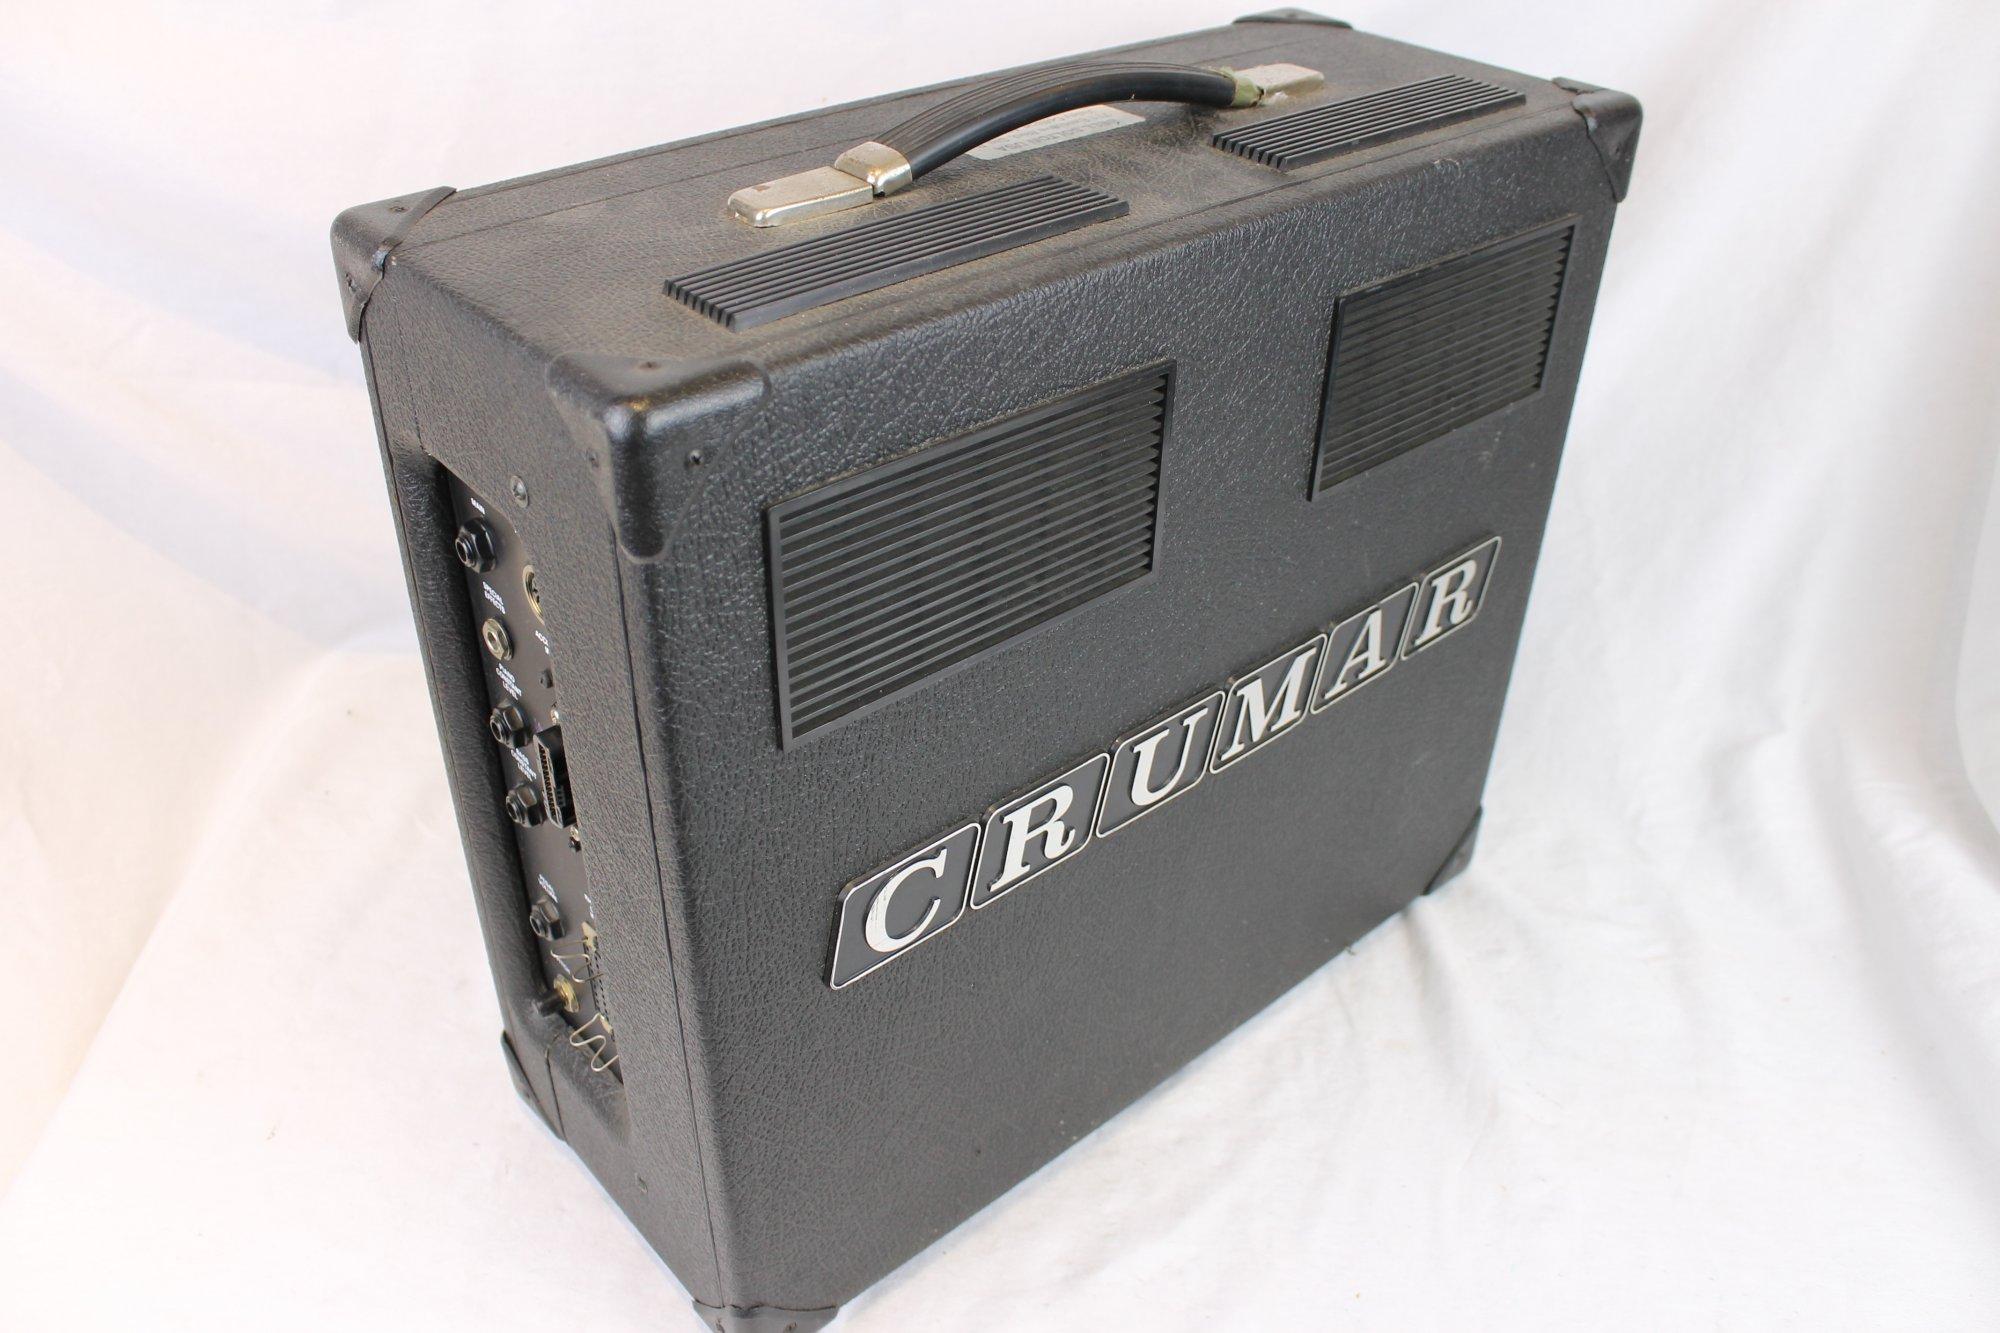 6099 - Crumar MGVX Accordion Tone Generator